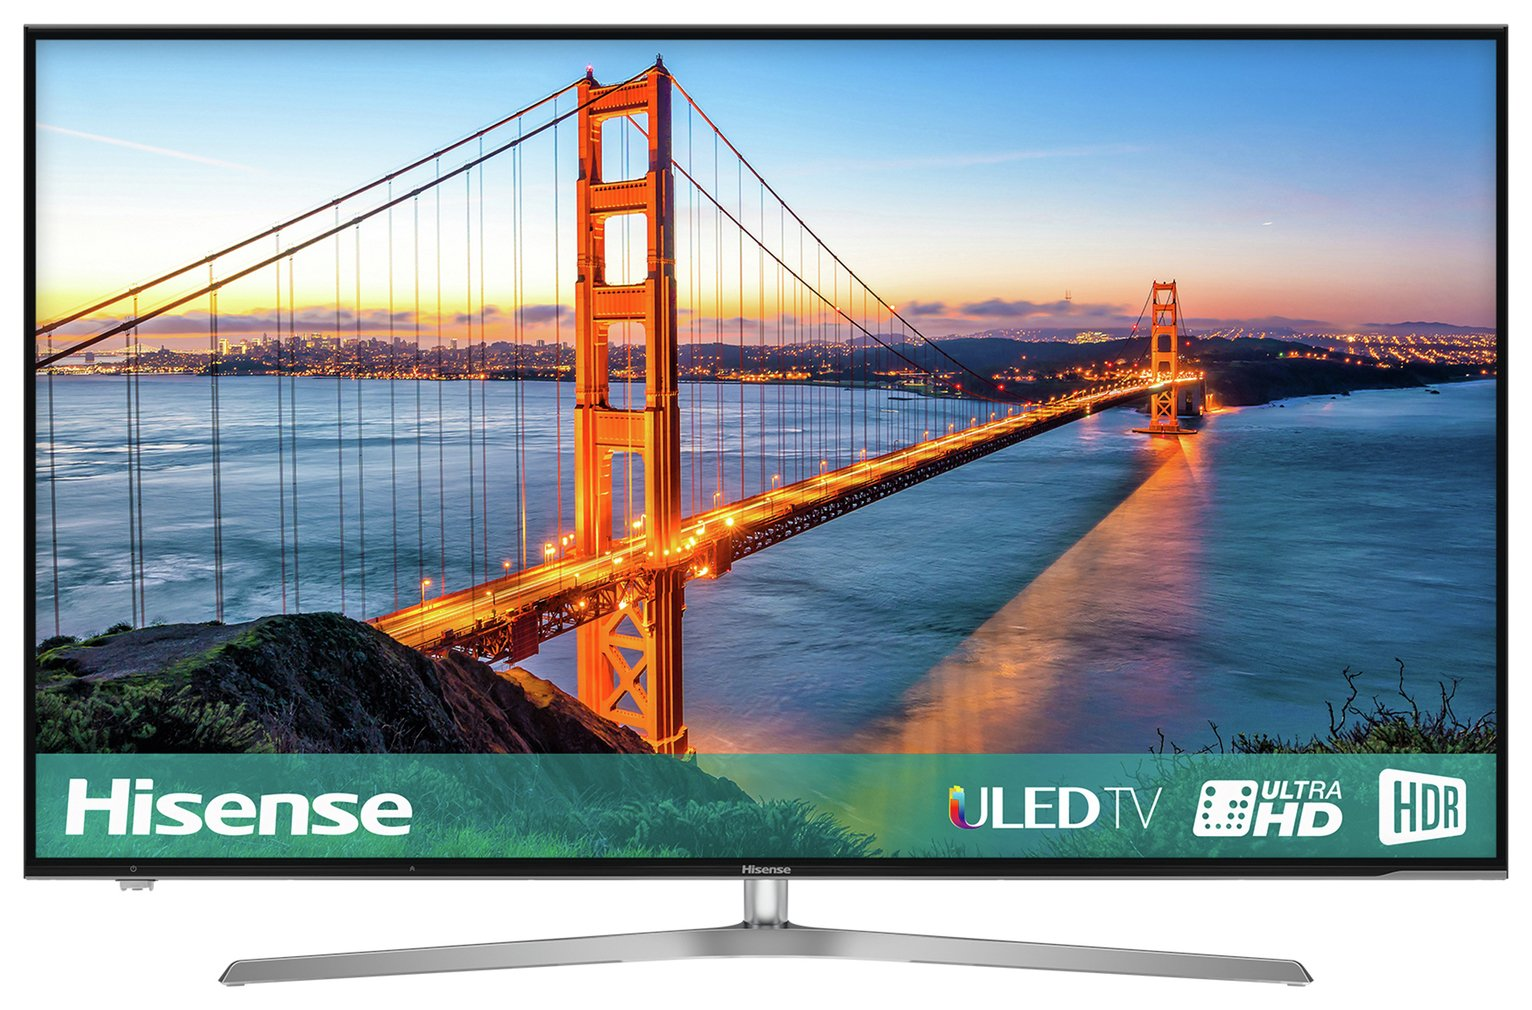 Image of Hisense 65 Inch 65U7AUK Smart 4K UHD TV with HDR